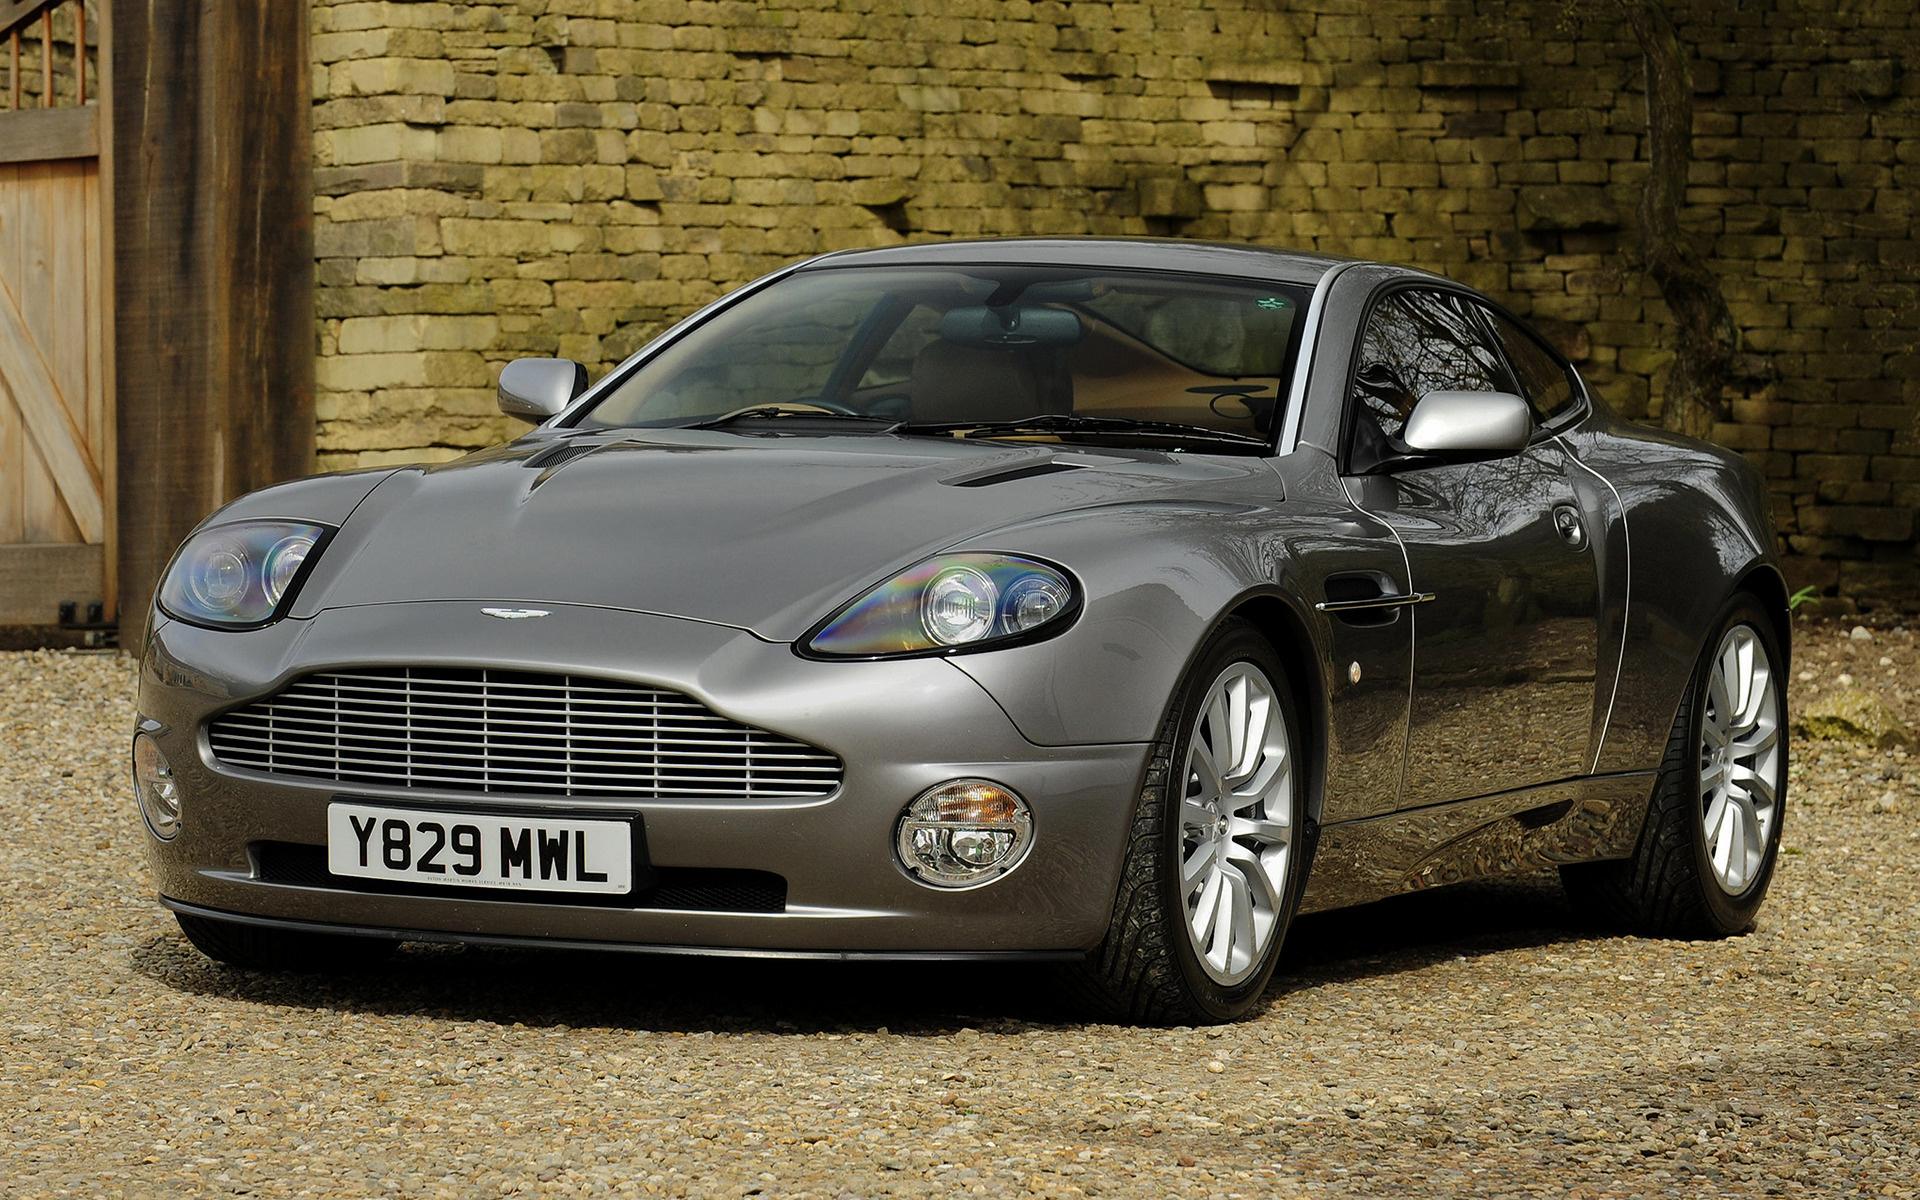 2001 Aston Martin V12 Vanquish Uk Wallpapers And Hd Images Car Pixel